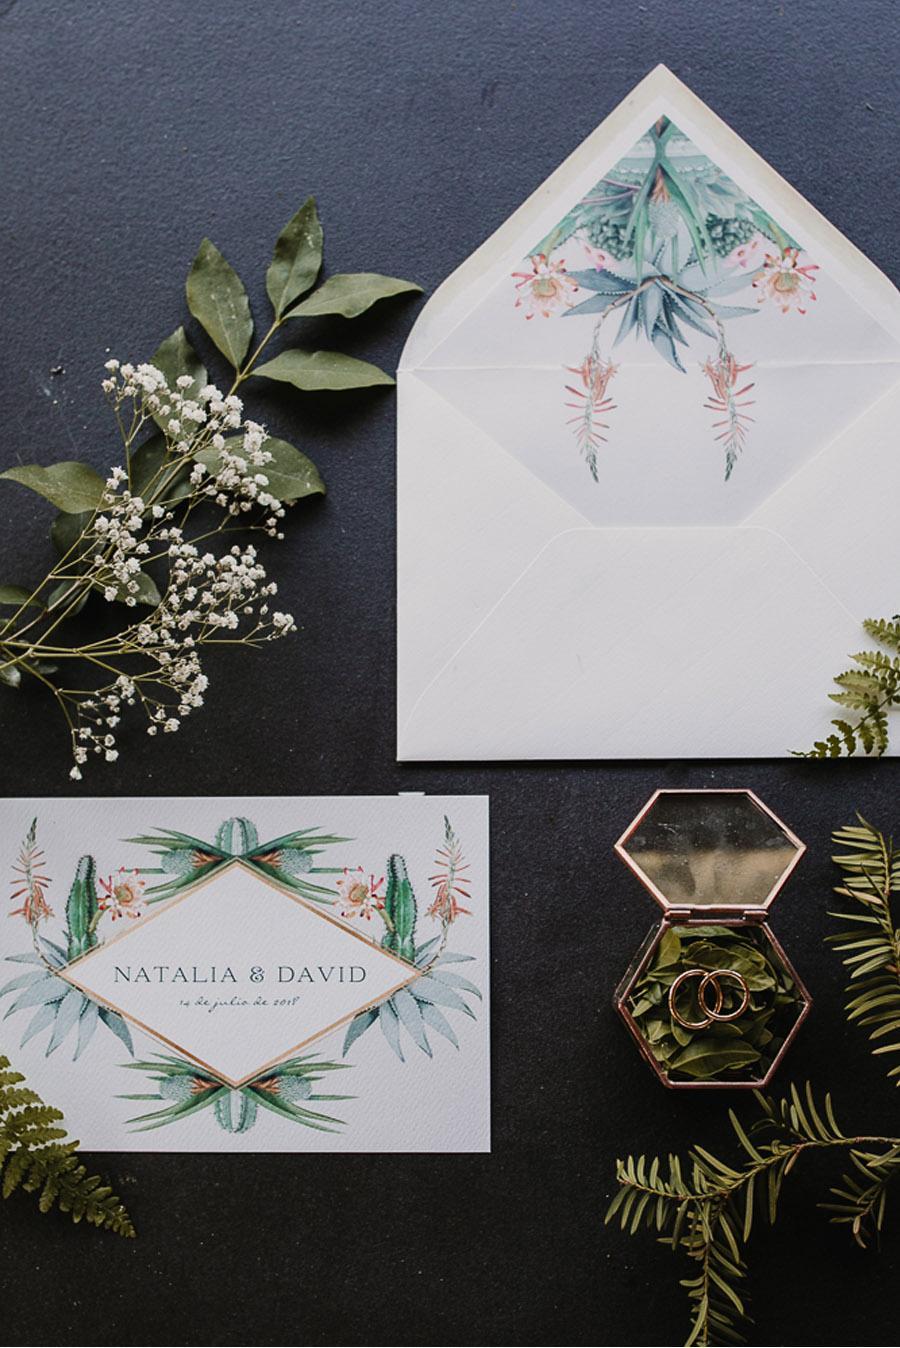 NATALIA & DAVID: UNA SENCILLA BODA DE CAMPO invitaciones-boda